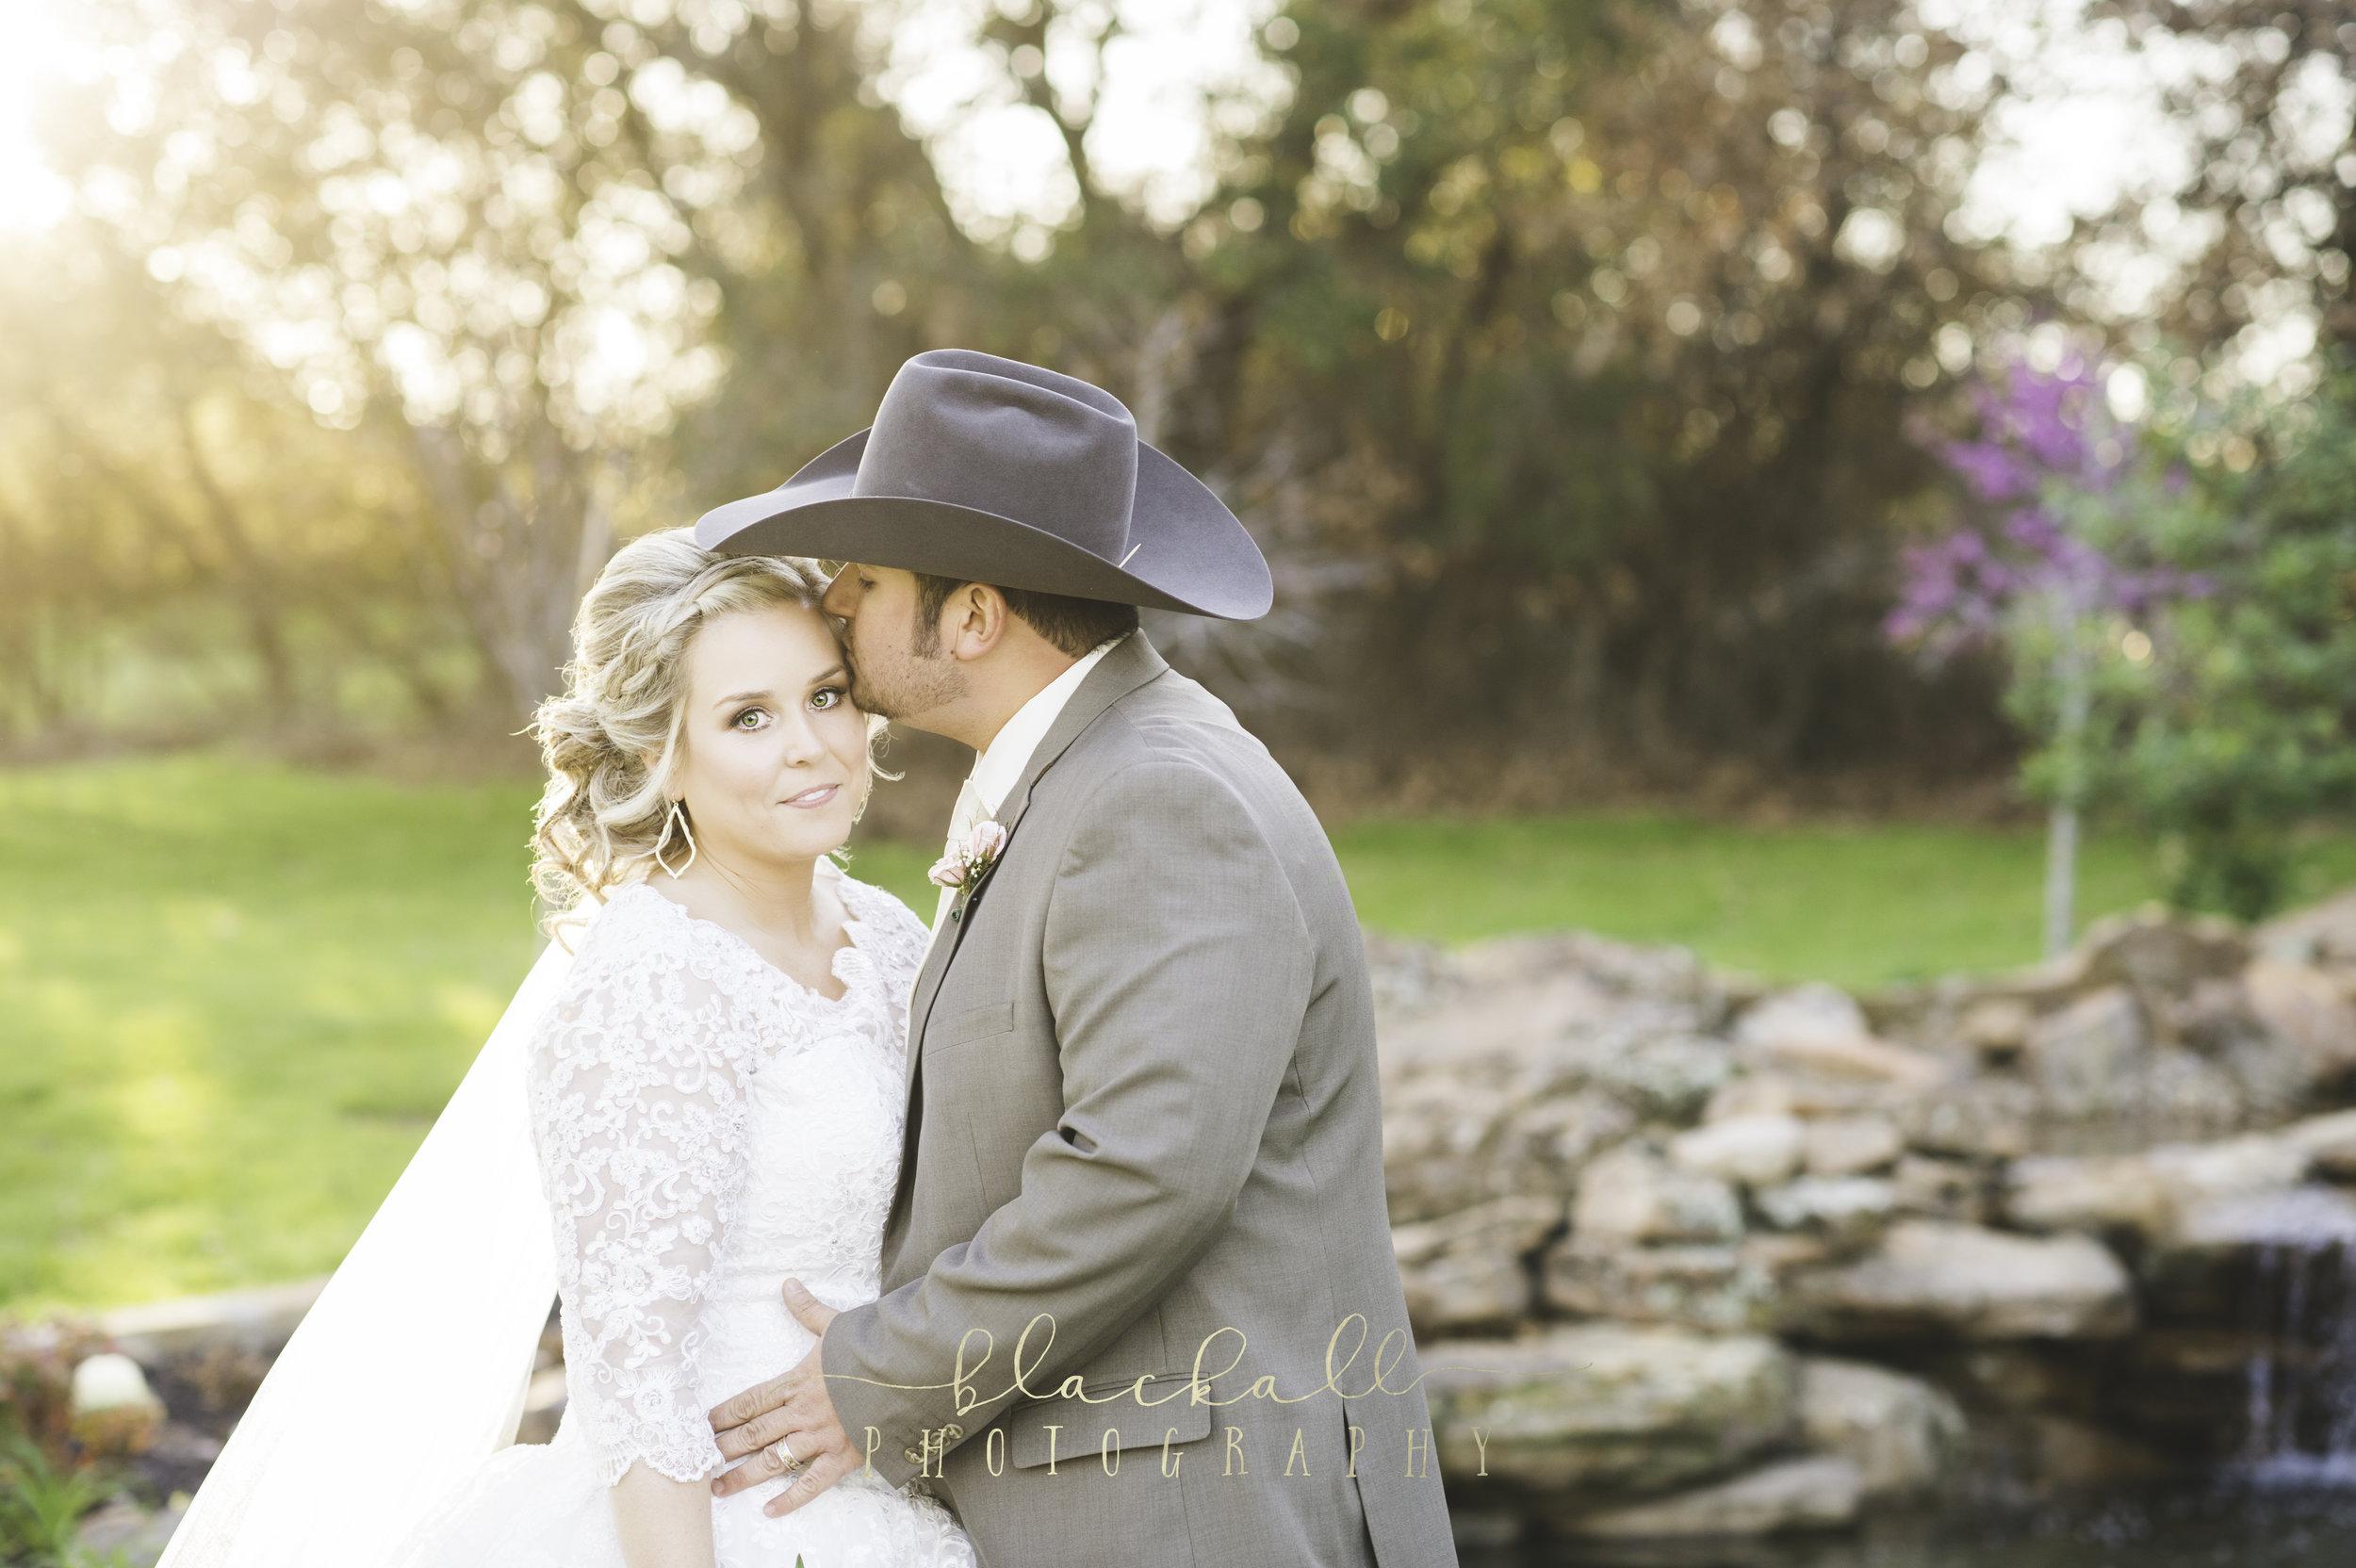 Cassie + Roy on their wedding day. February 25, 2017